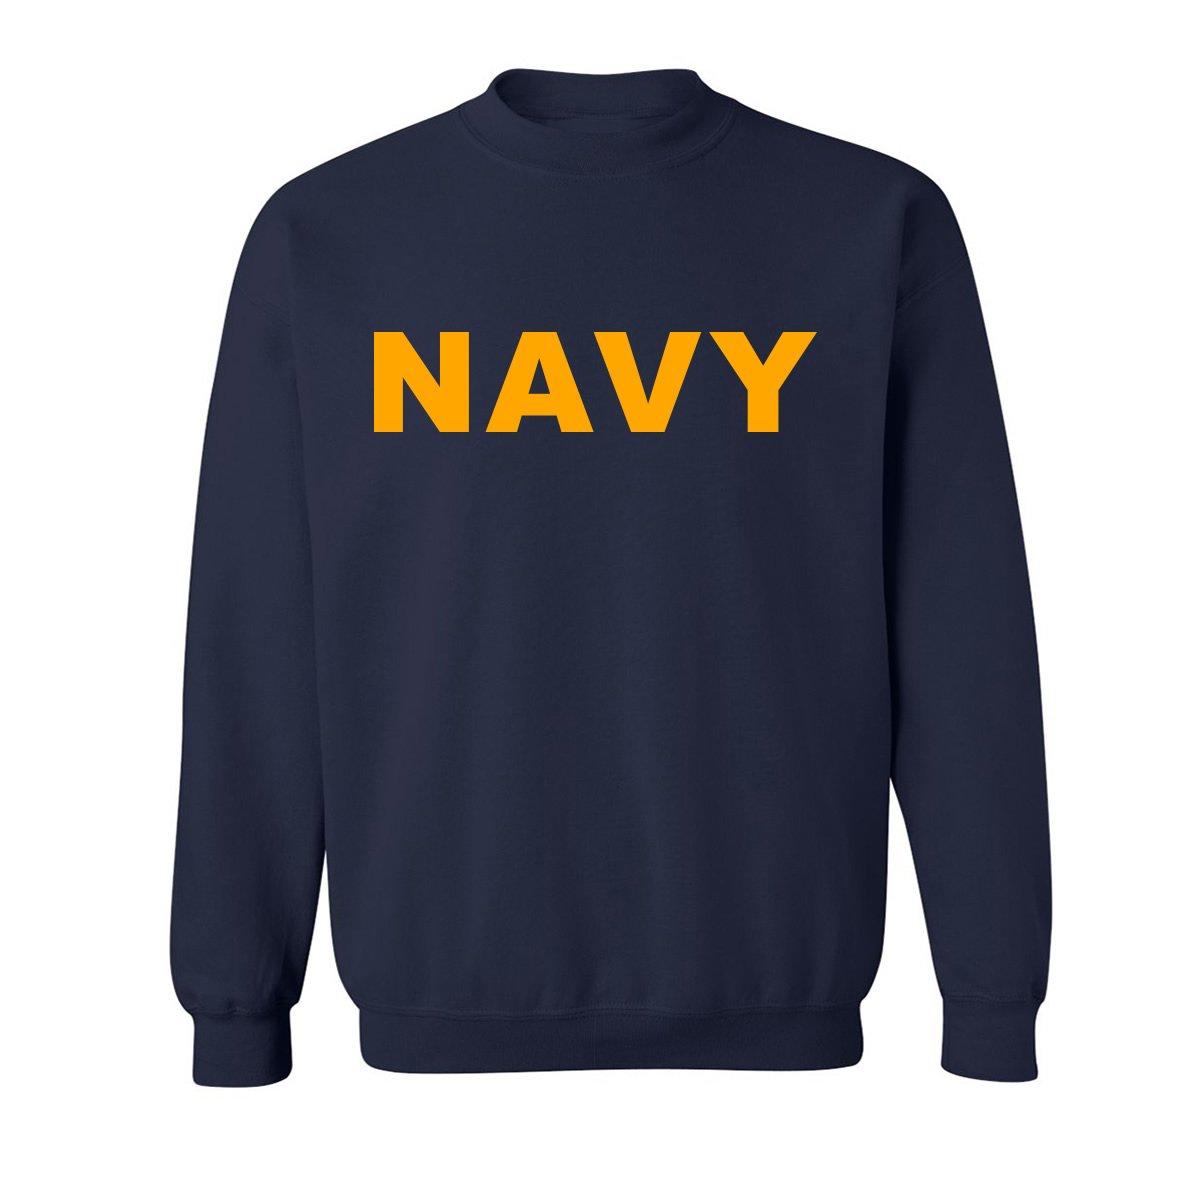 Navy NAVY Crewneck Sweatshirt with Gold print - Large